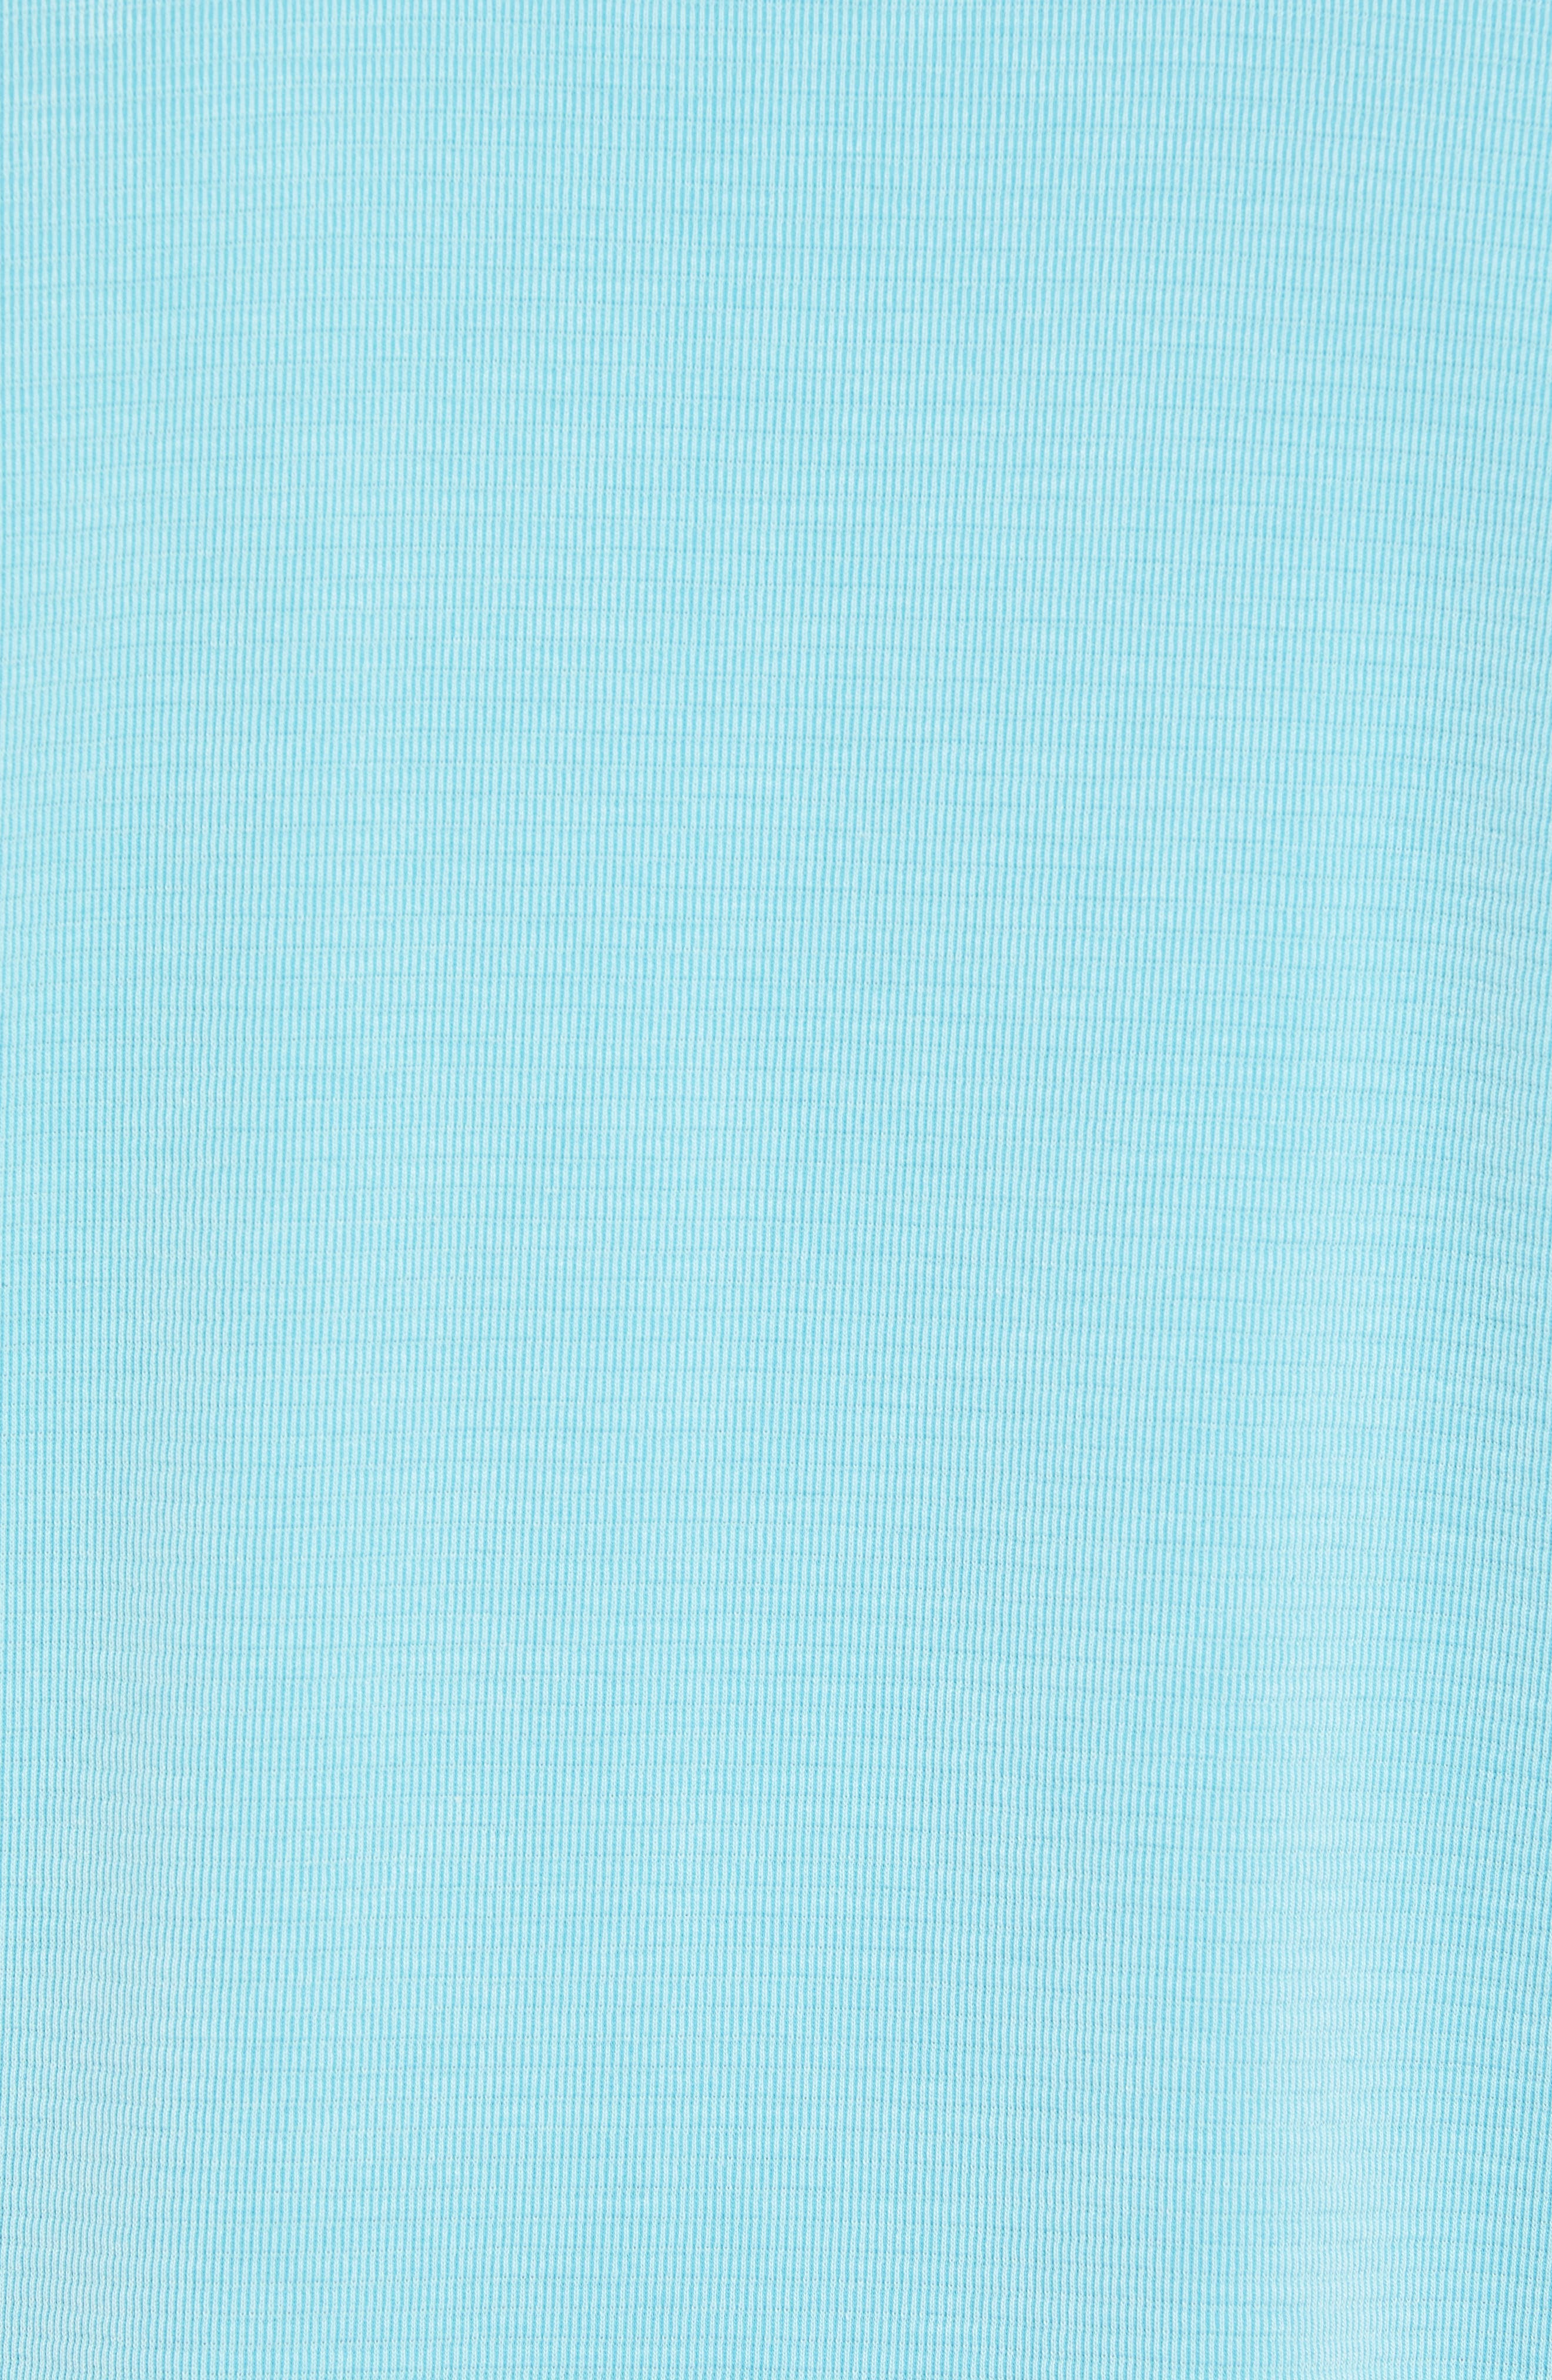 Coastal Crest Polo,                             Alternate thumbnail 53, color,